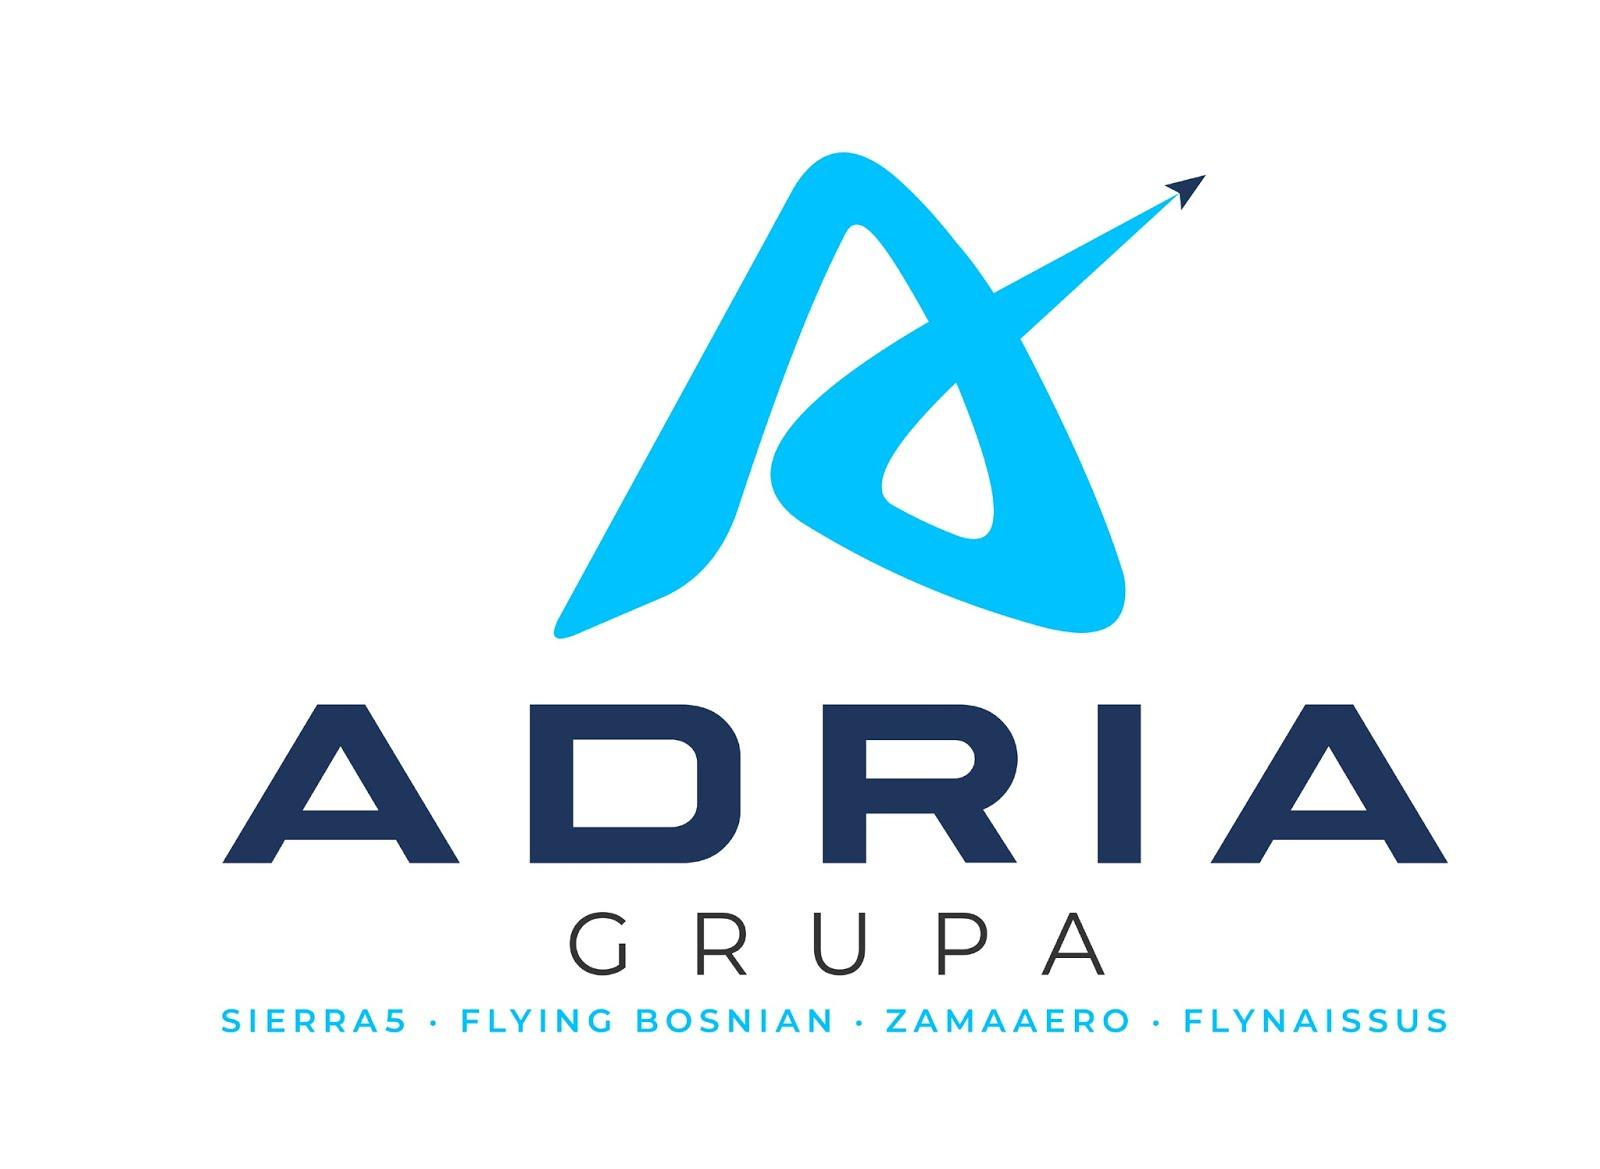 ADRIA GROUP MEMBERS